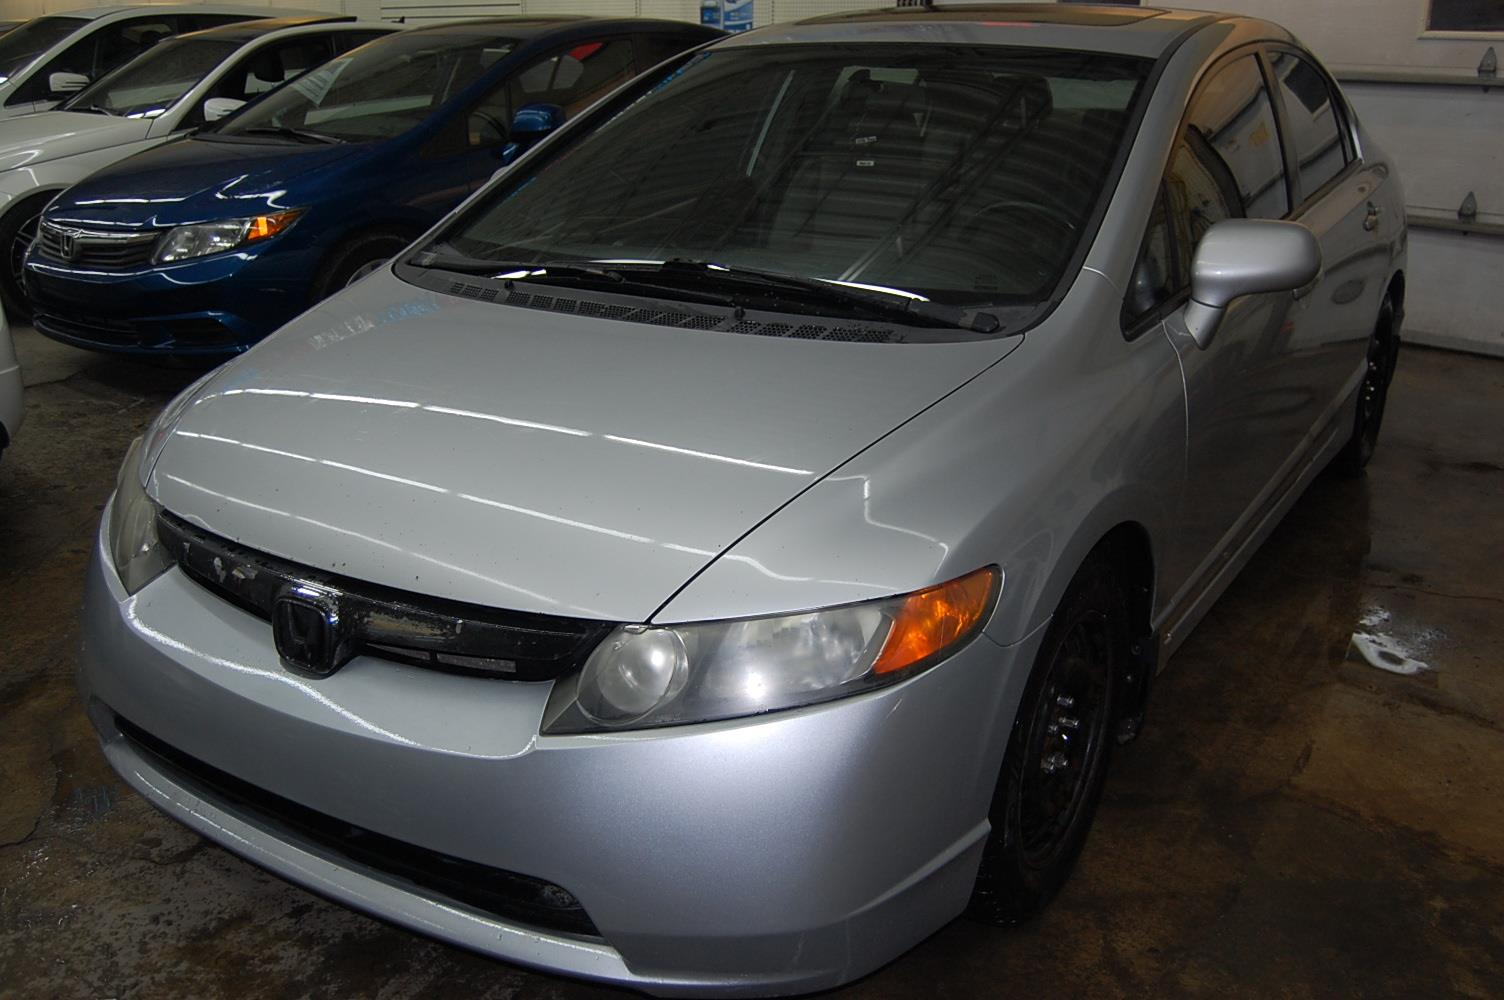 Honda Civic Sdn 2008 4dr Man EX-L